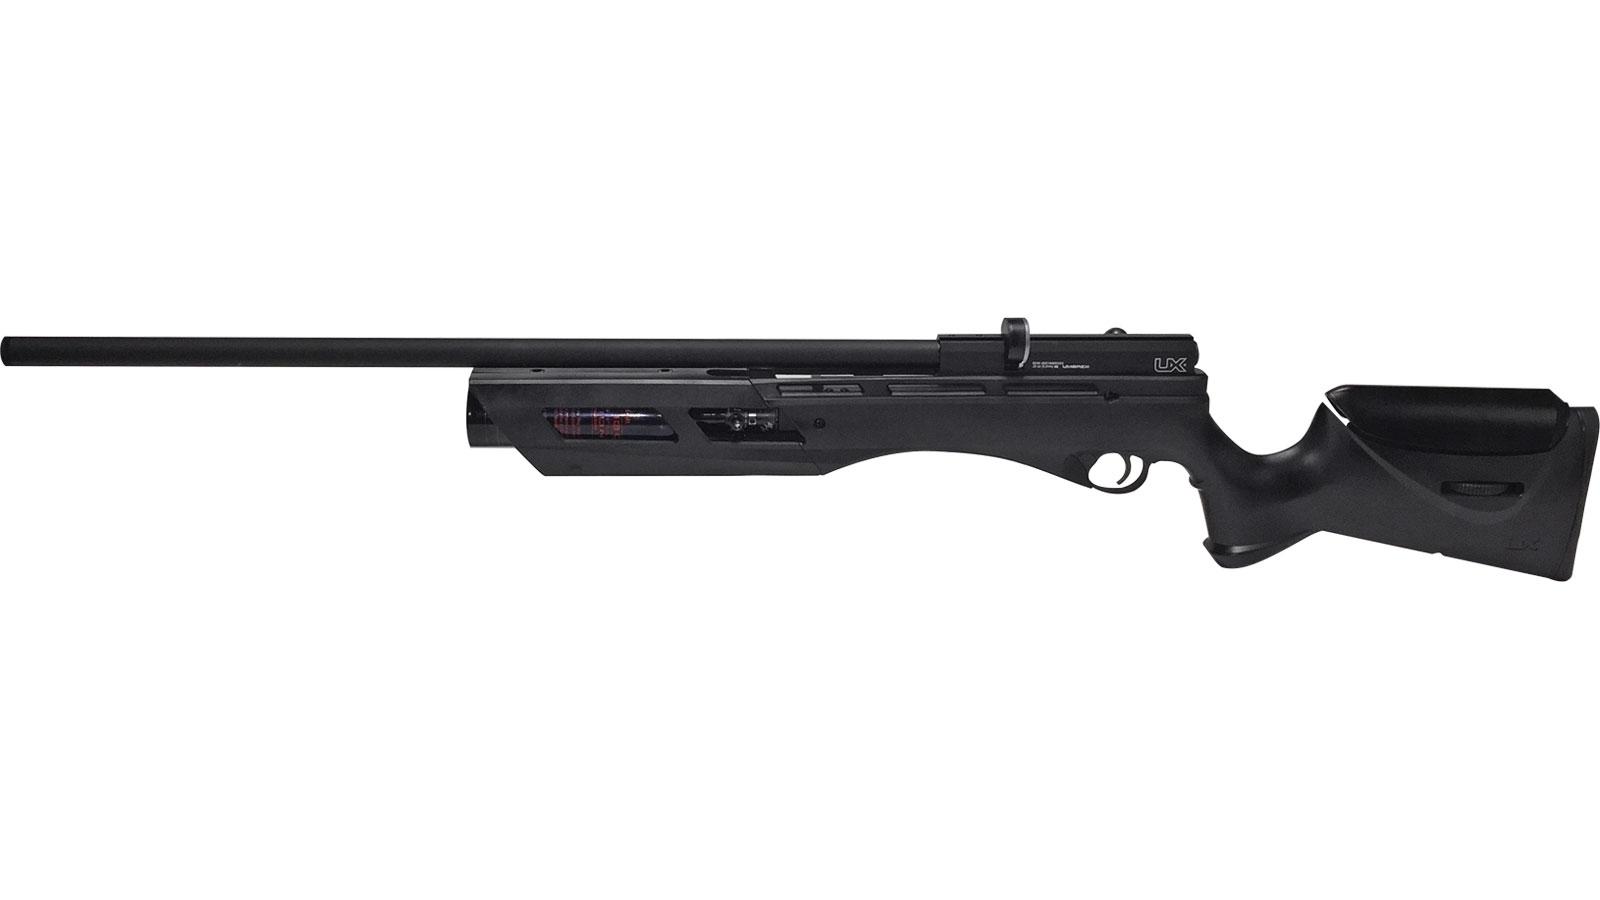 Umarex Gauntlet PCP Air Rifle, .22 Caliber, 28.5 quot Barrel, 10 Rounds